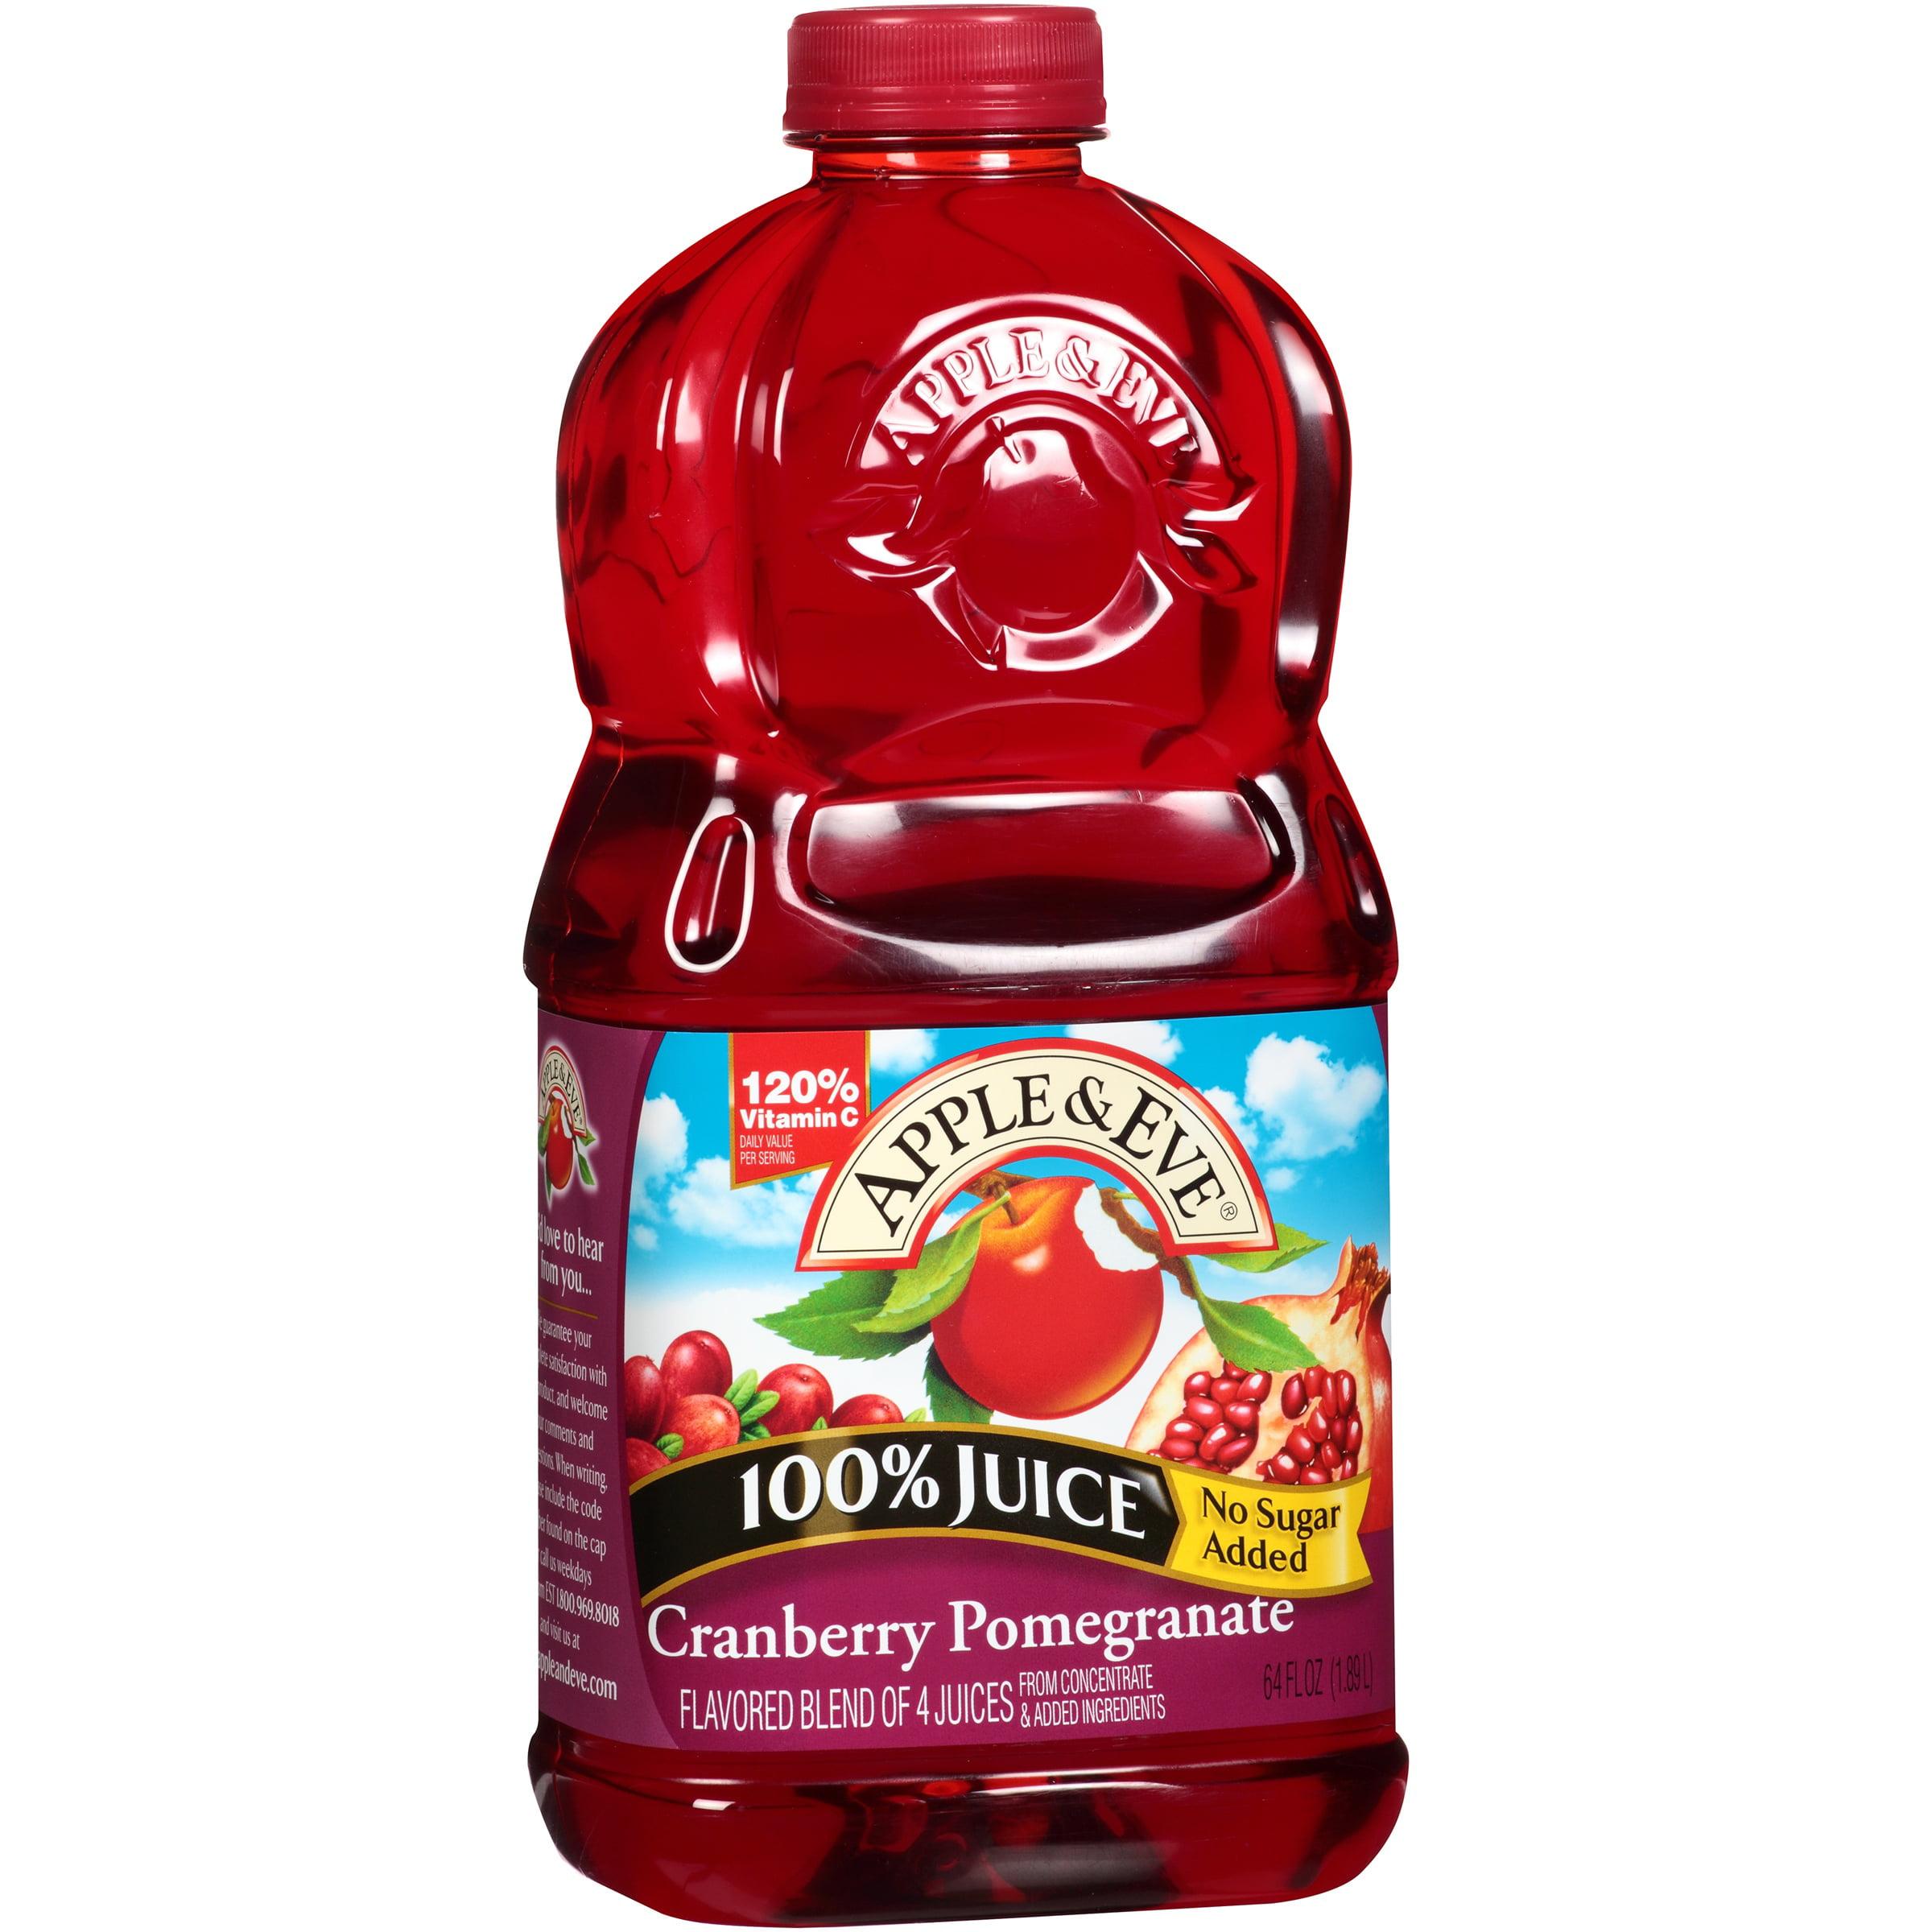 Apple & Eve Cranberry Pomegranate 100% Juice 64 fl. oz. Bottle by Apple & Eve, L.L.P.